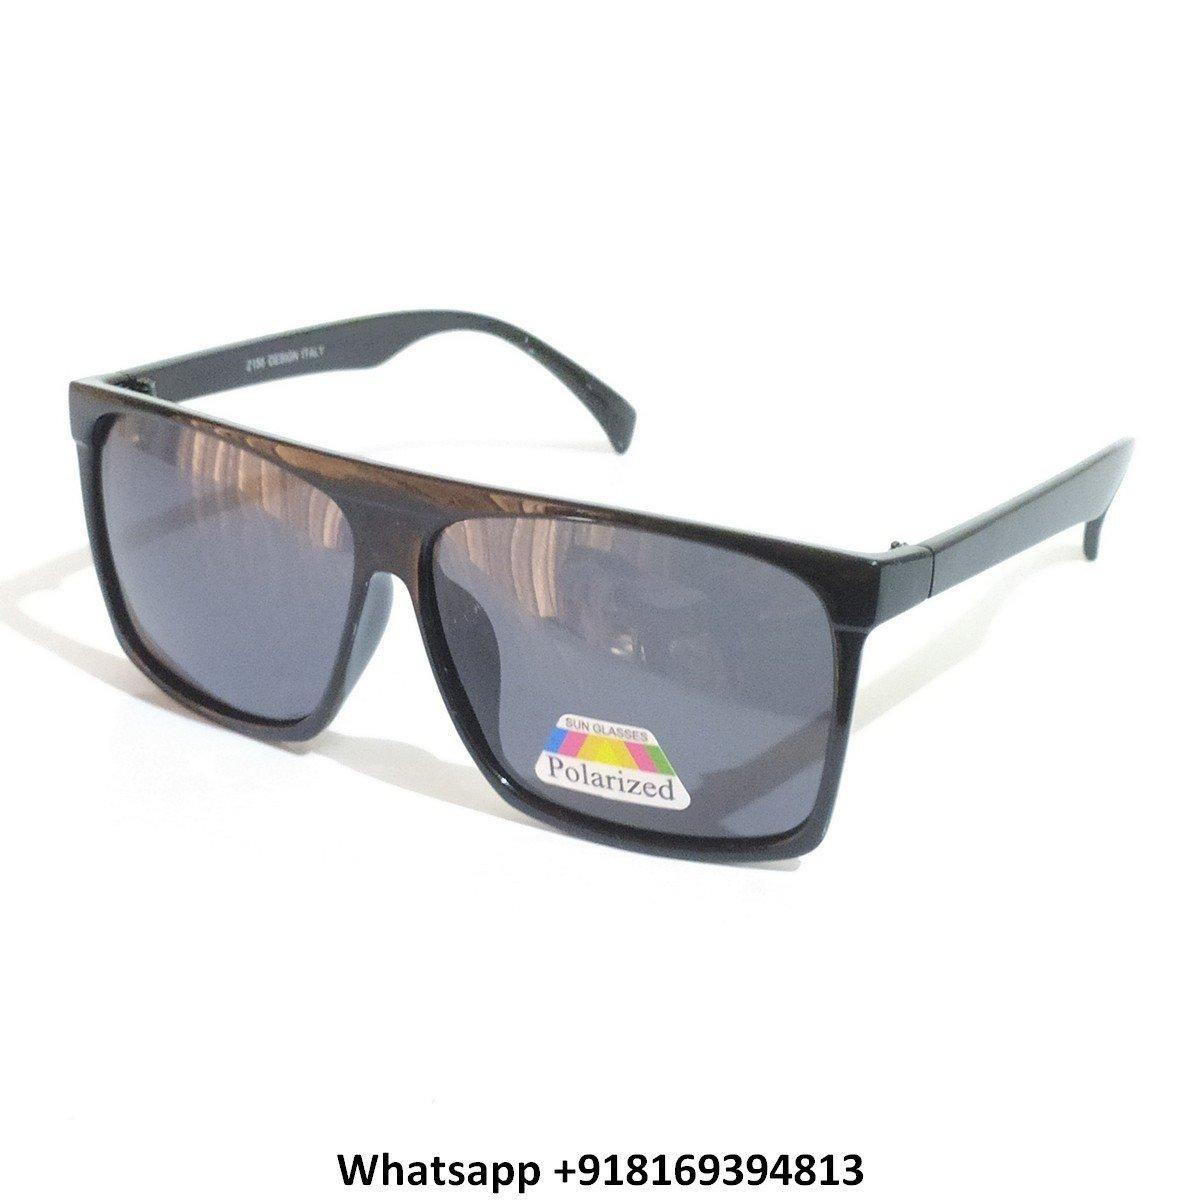 Trendy Square Polarized Sunglasses for Men and Women 2156BK